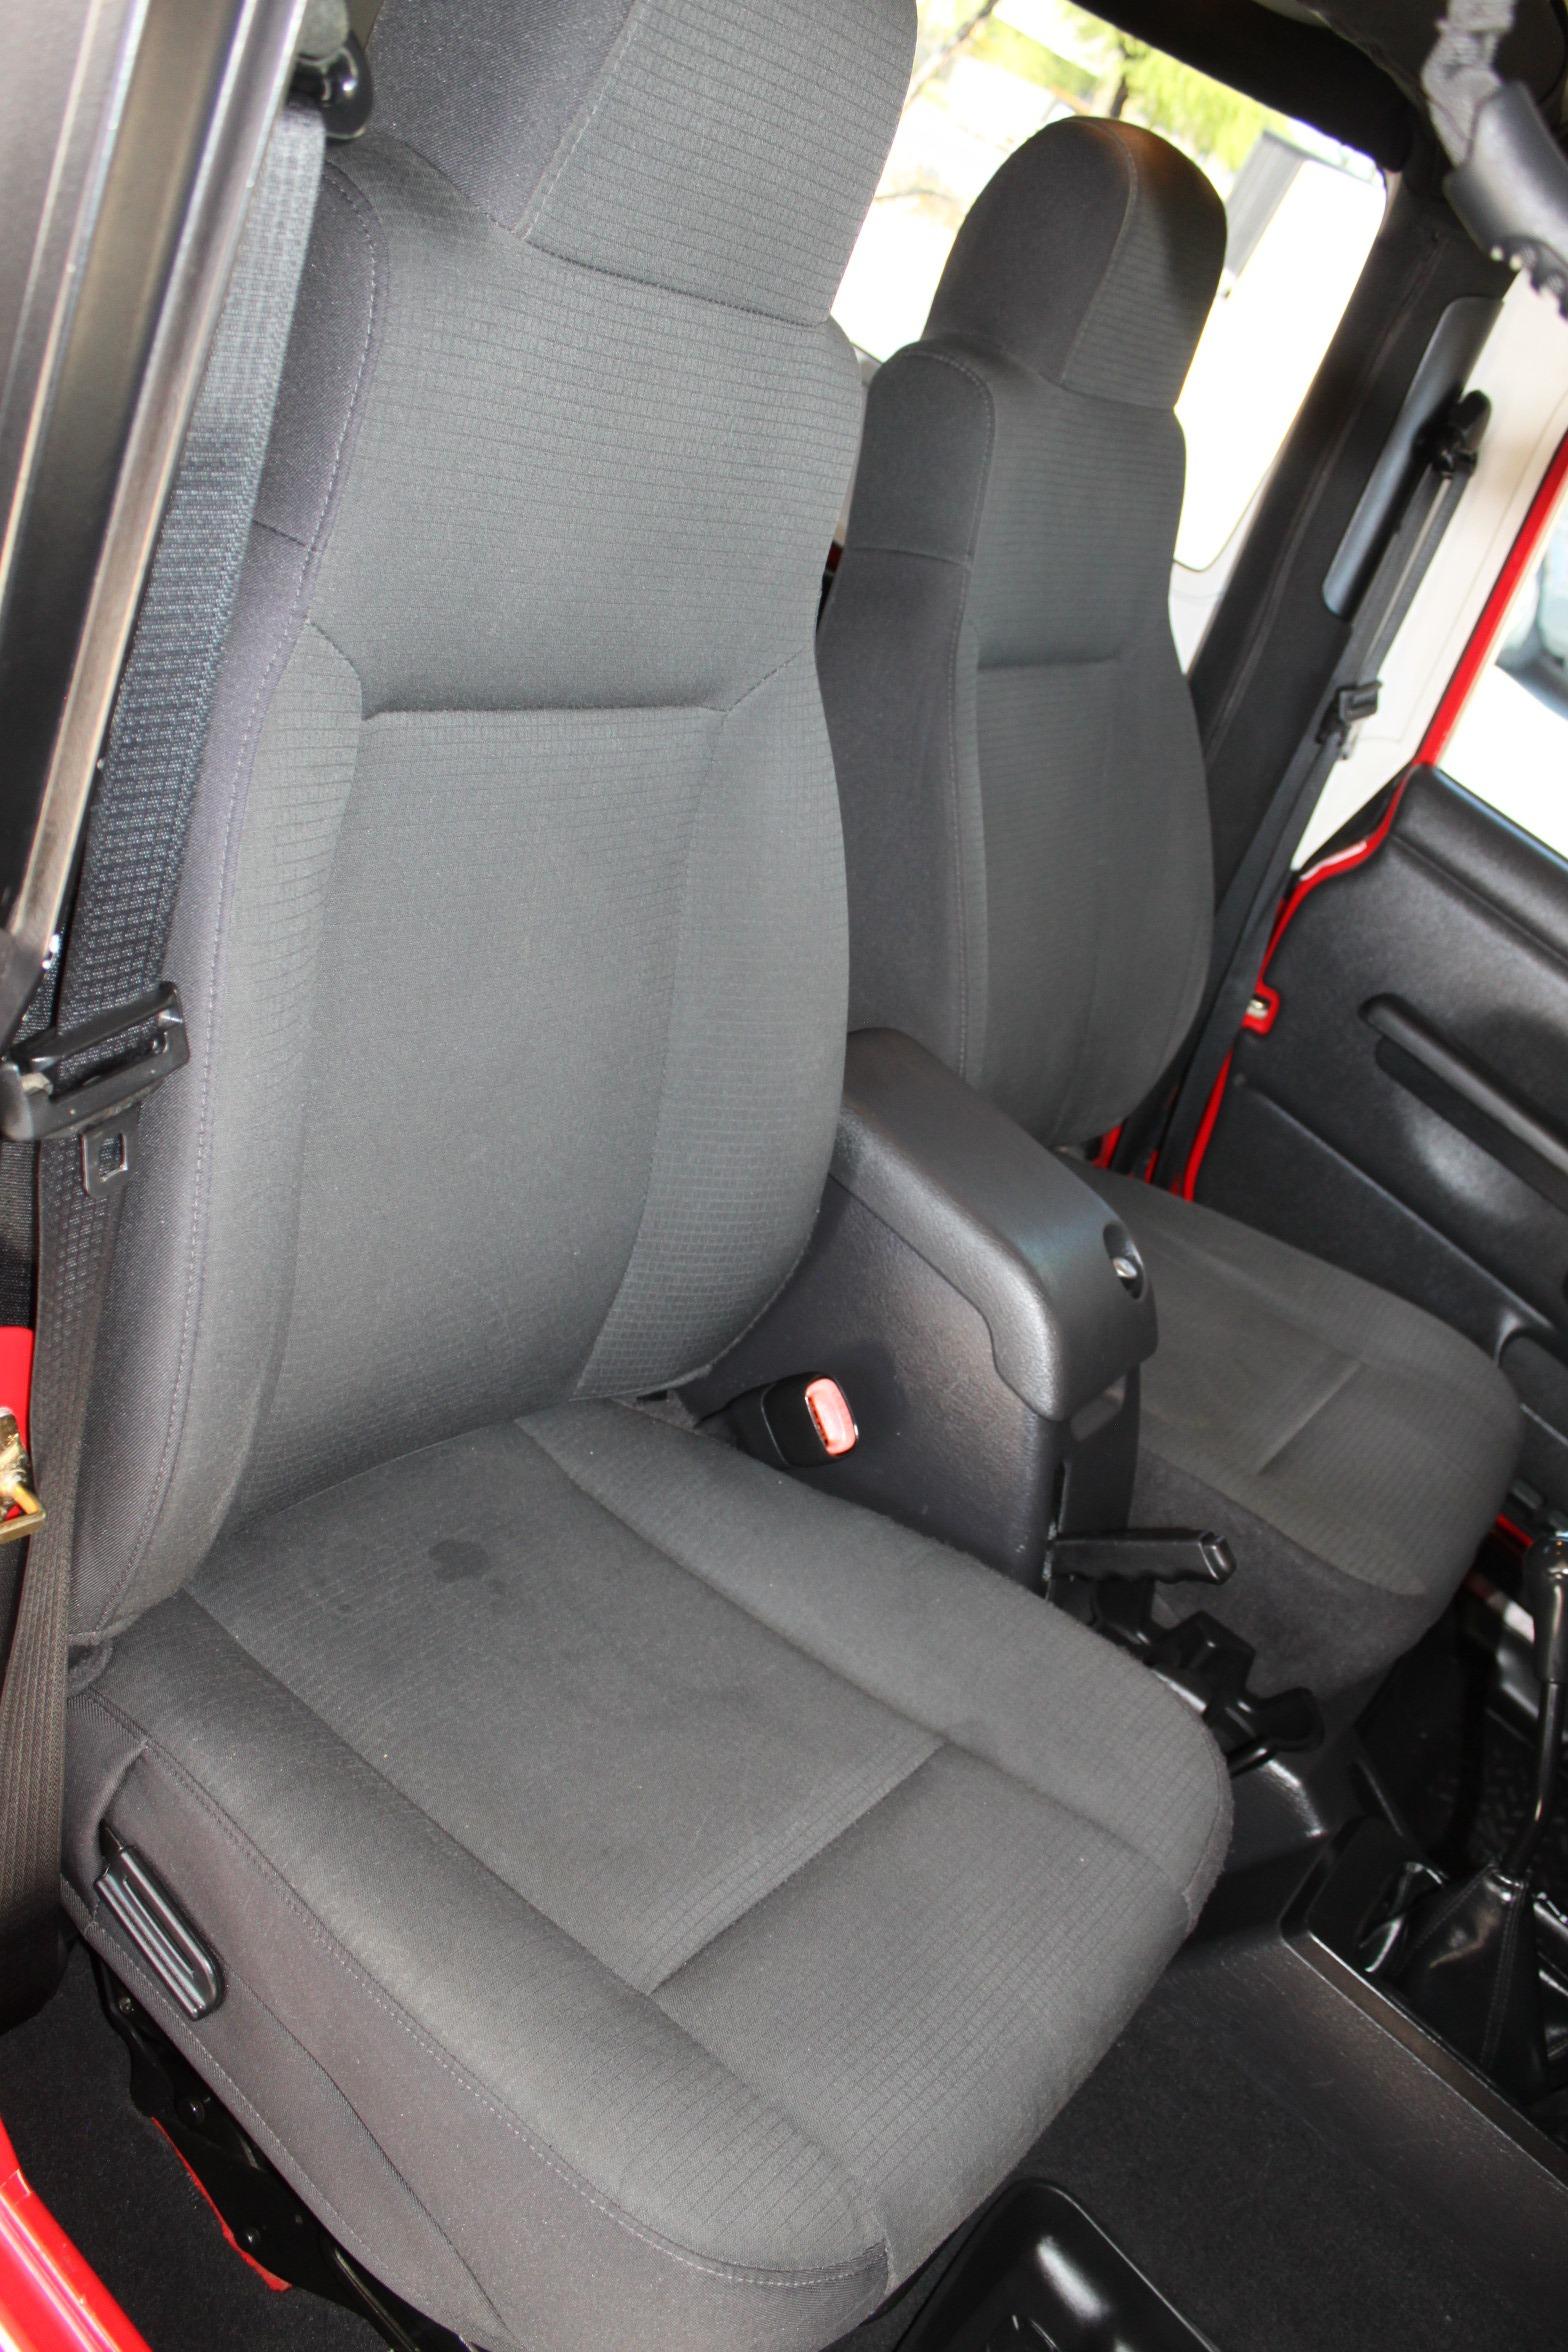 Used-2006-Jeep-Wrangler-4X4-LJ-Unlimited-LWB-BMW